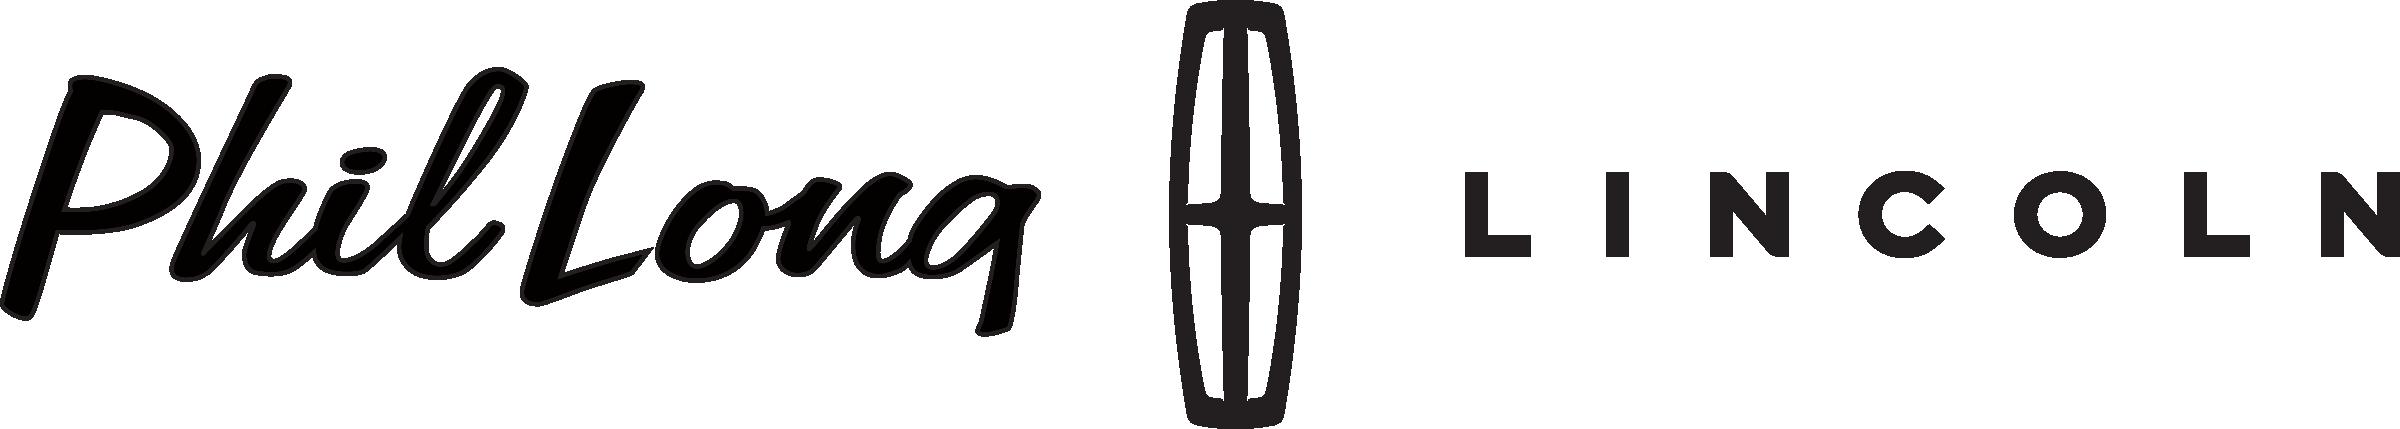 Phil Long Collision Motor City - impremedia.net